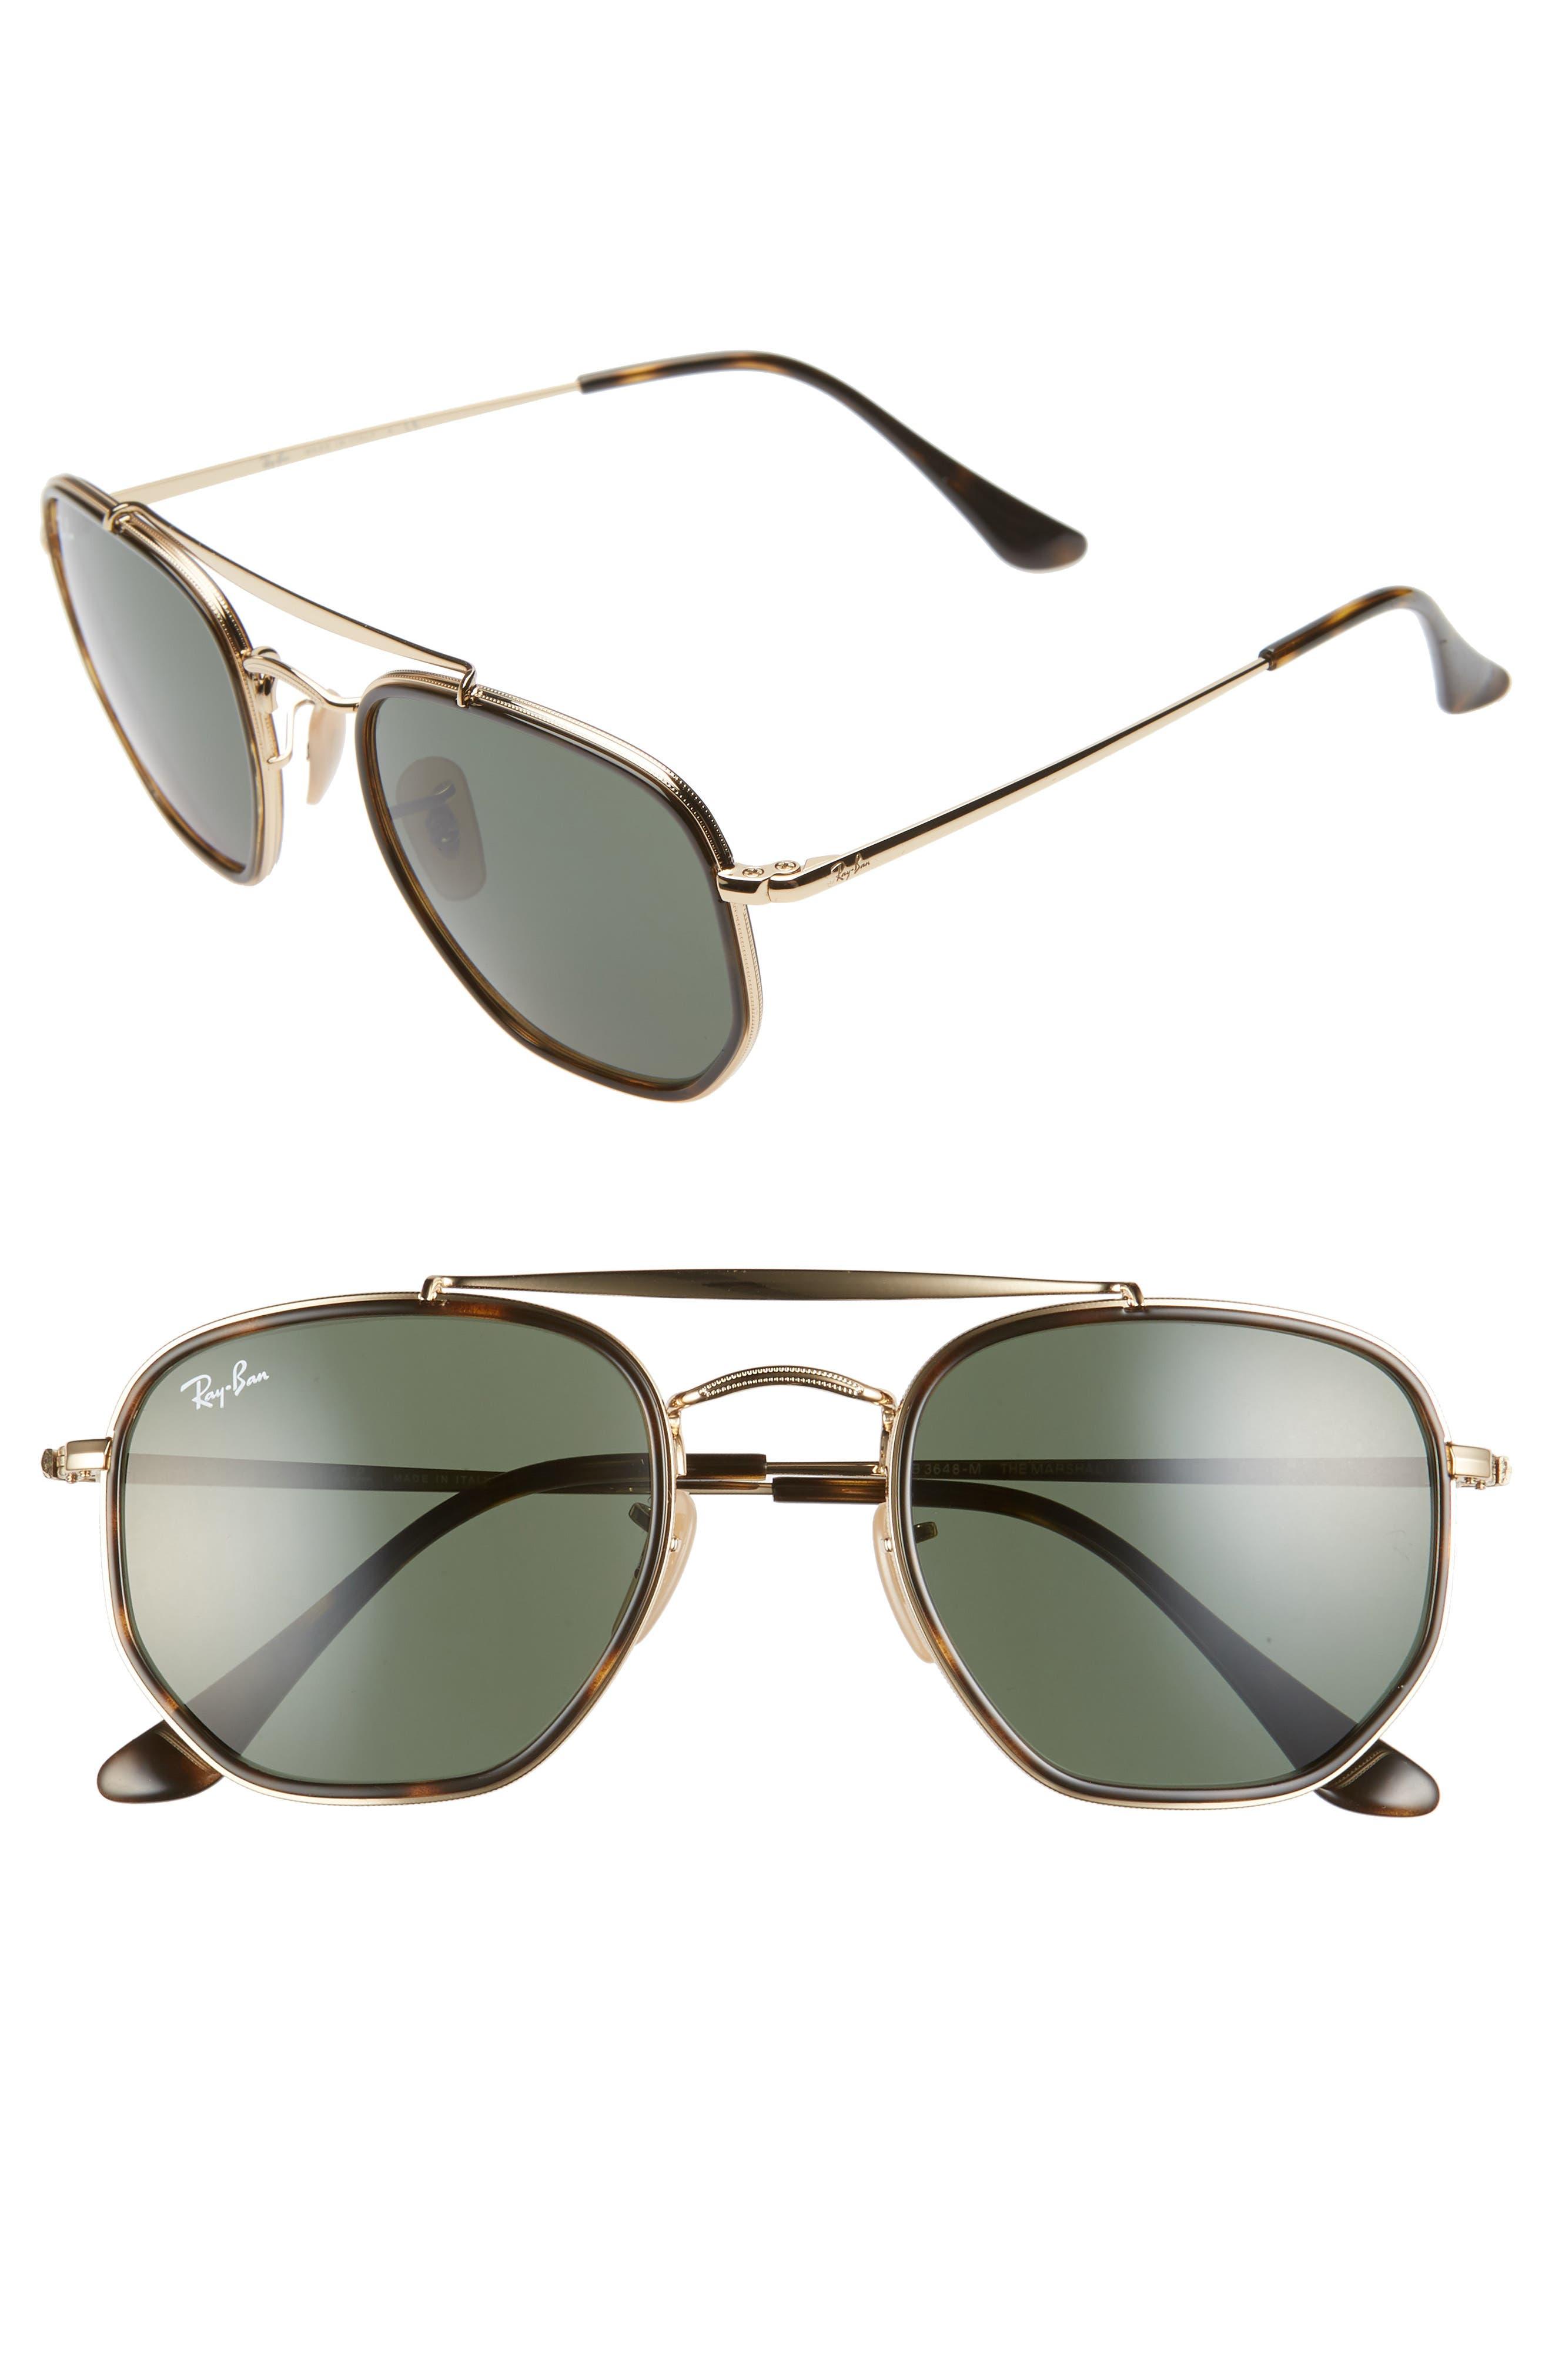 Ray-Ban 52Mm Irregular Aviator Sunglasses - Gold/ Green Solid